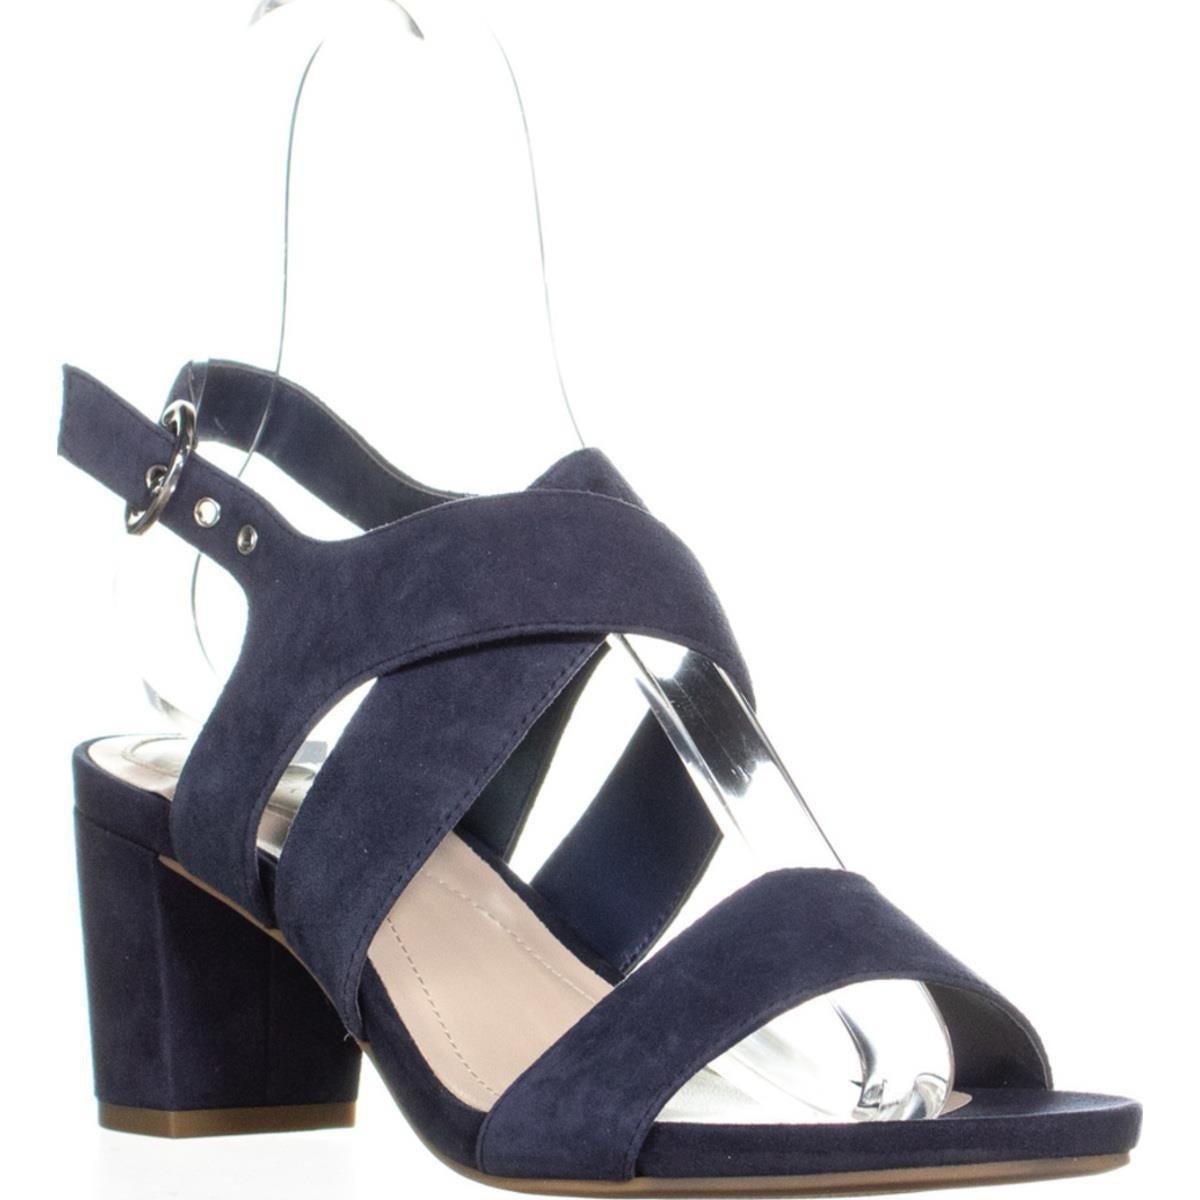 dc53fb1eb Shop A35 Regann Block-Heel Sandals, Moonstone - Free Shipping On ...